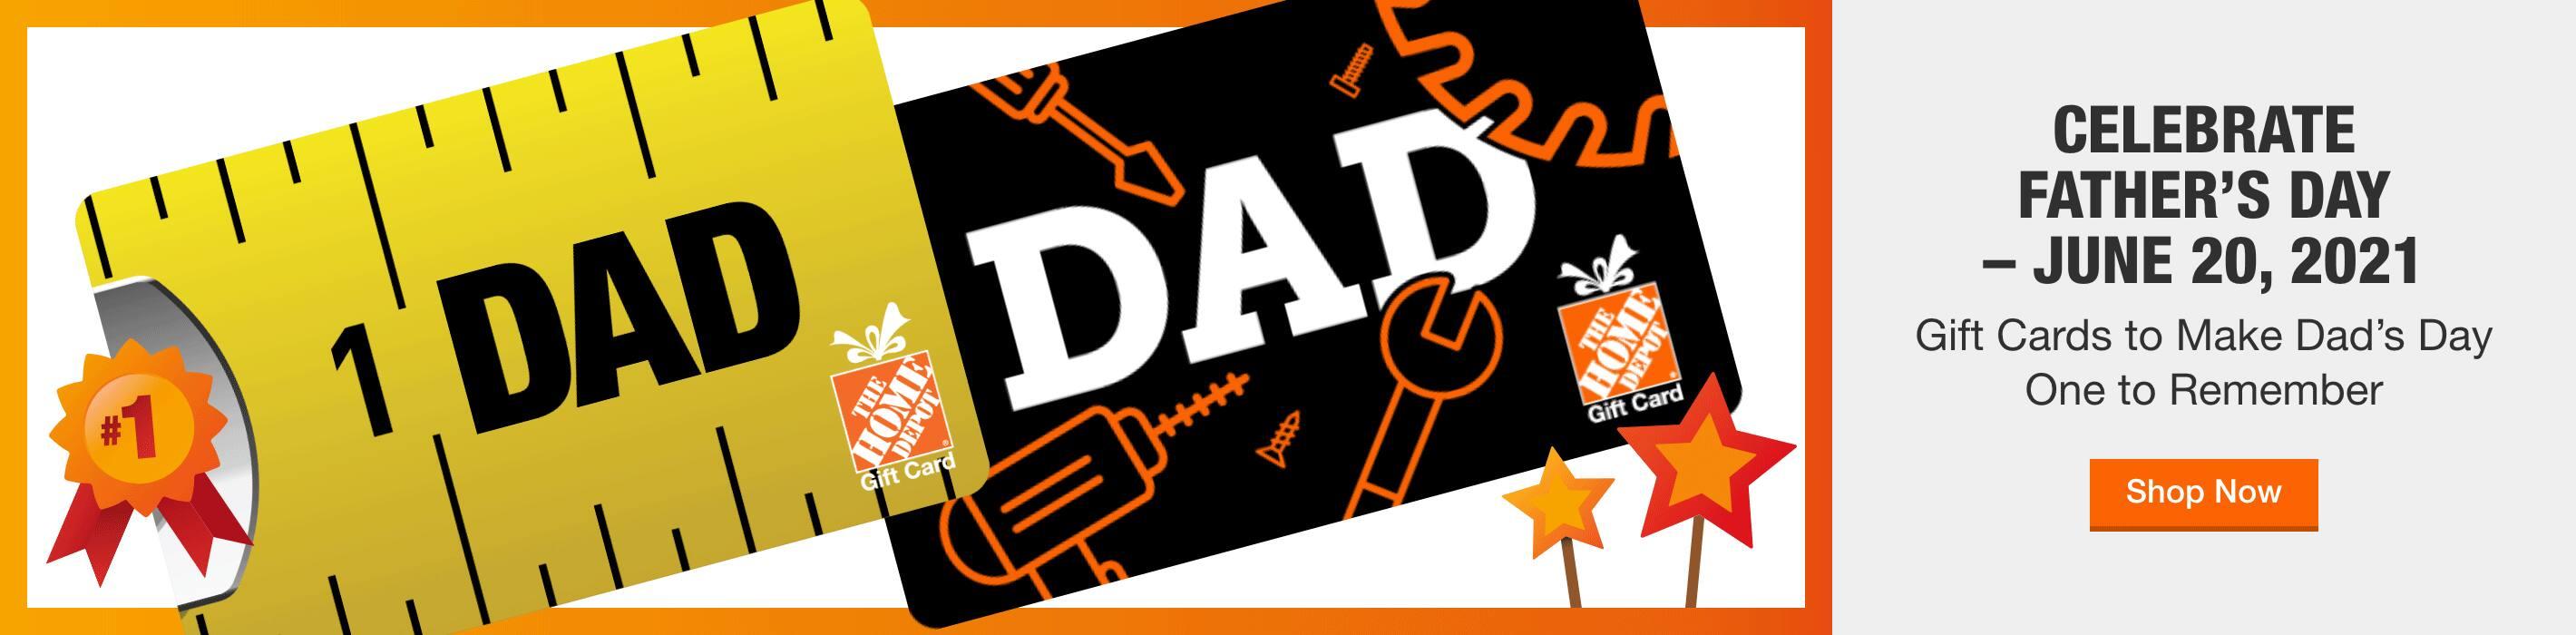 Celebrate Father'S DAY – June 20, 2021